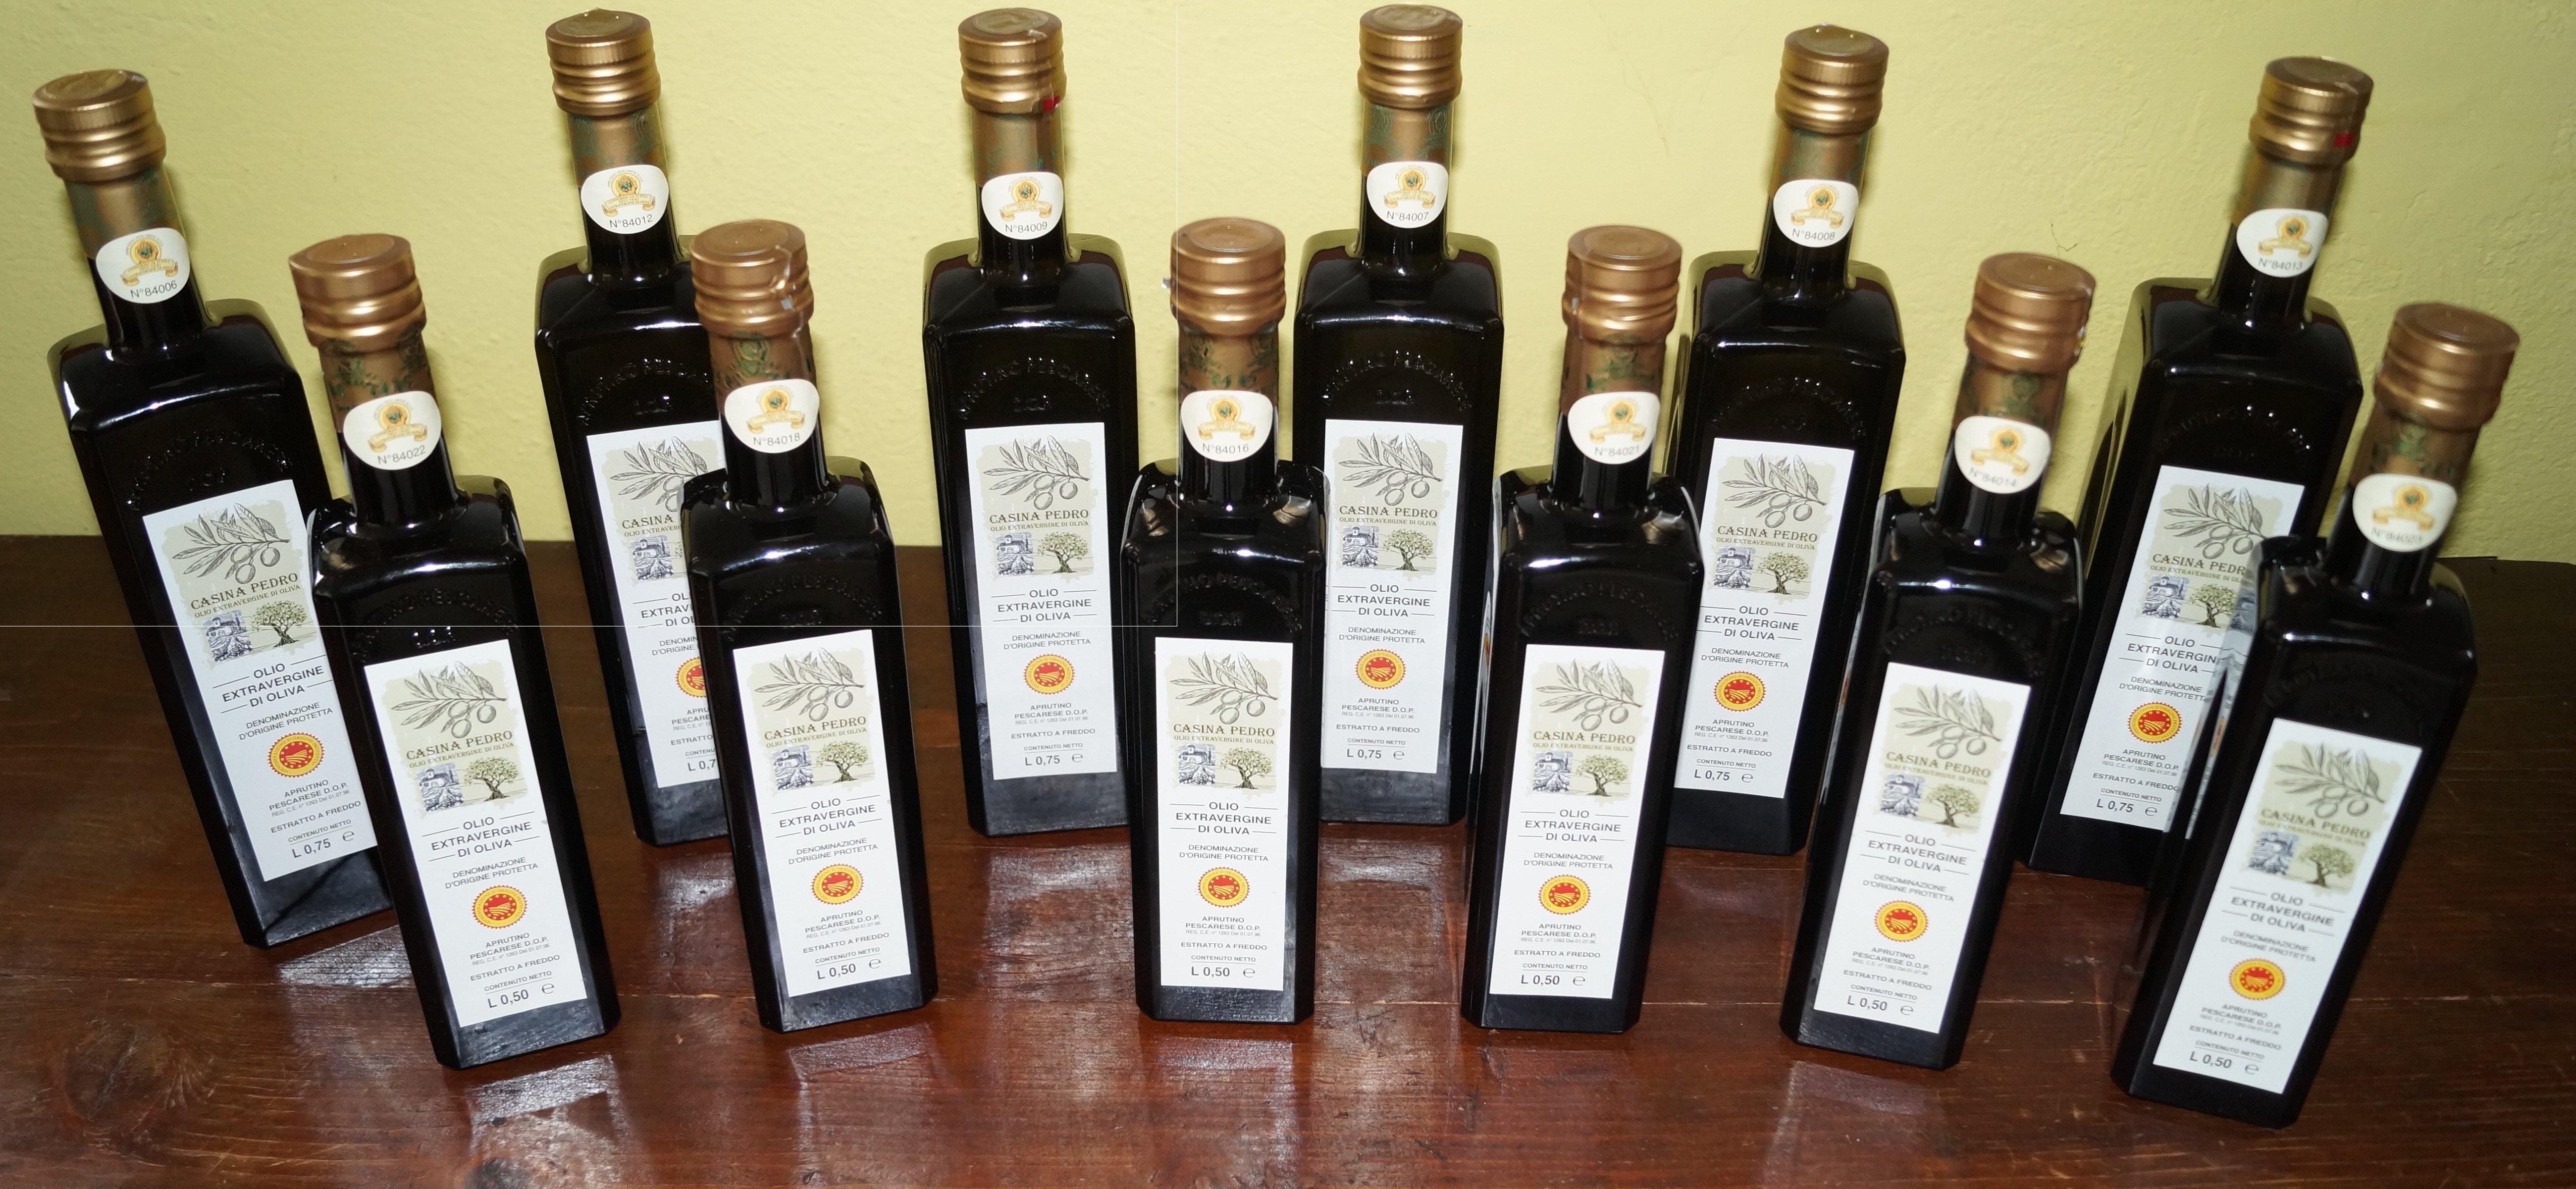 Olio Casina Pedro conf. Assortimento 06 Bottiglie da L.075 + 06 Bottiglie da L.050 00002